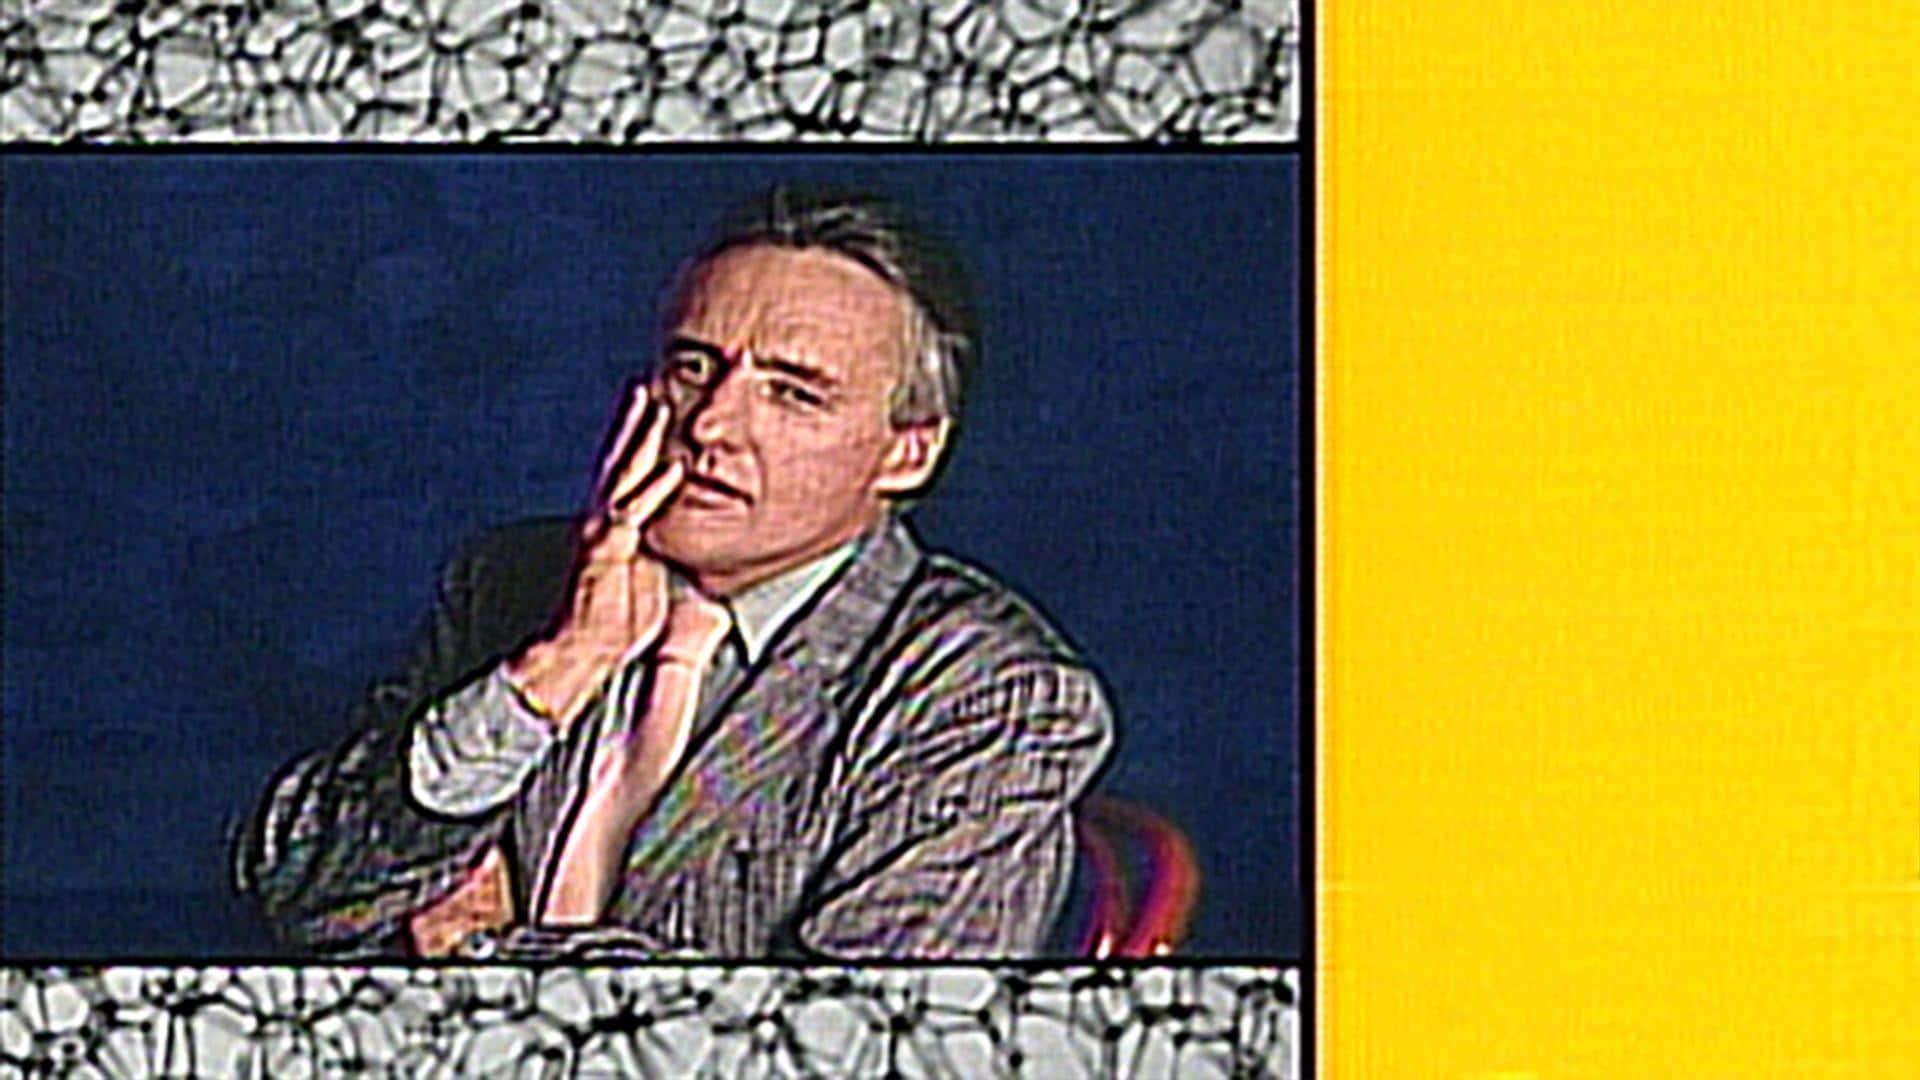 Dennis Hopper: May 23, 1987